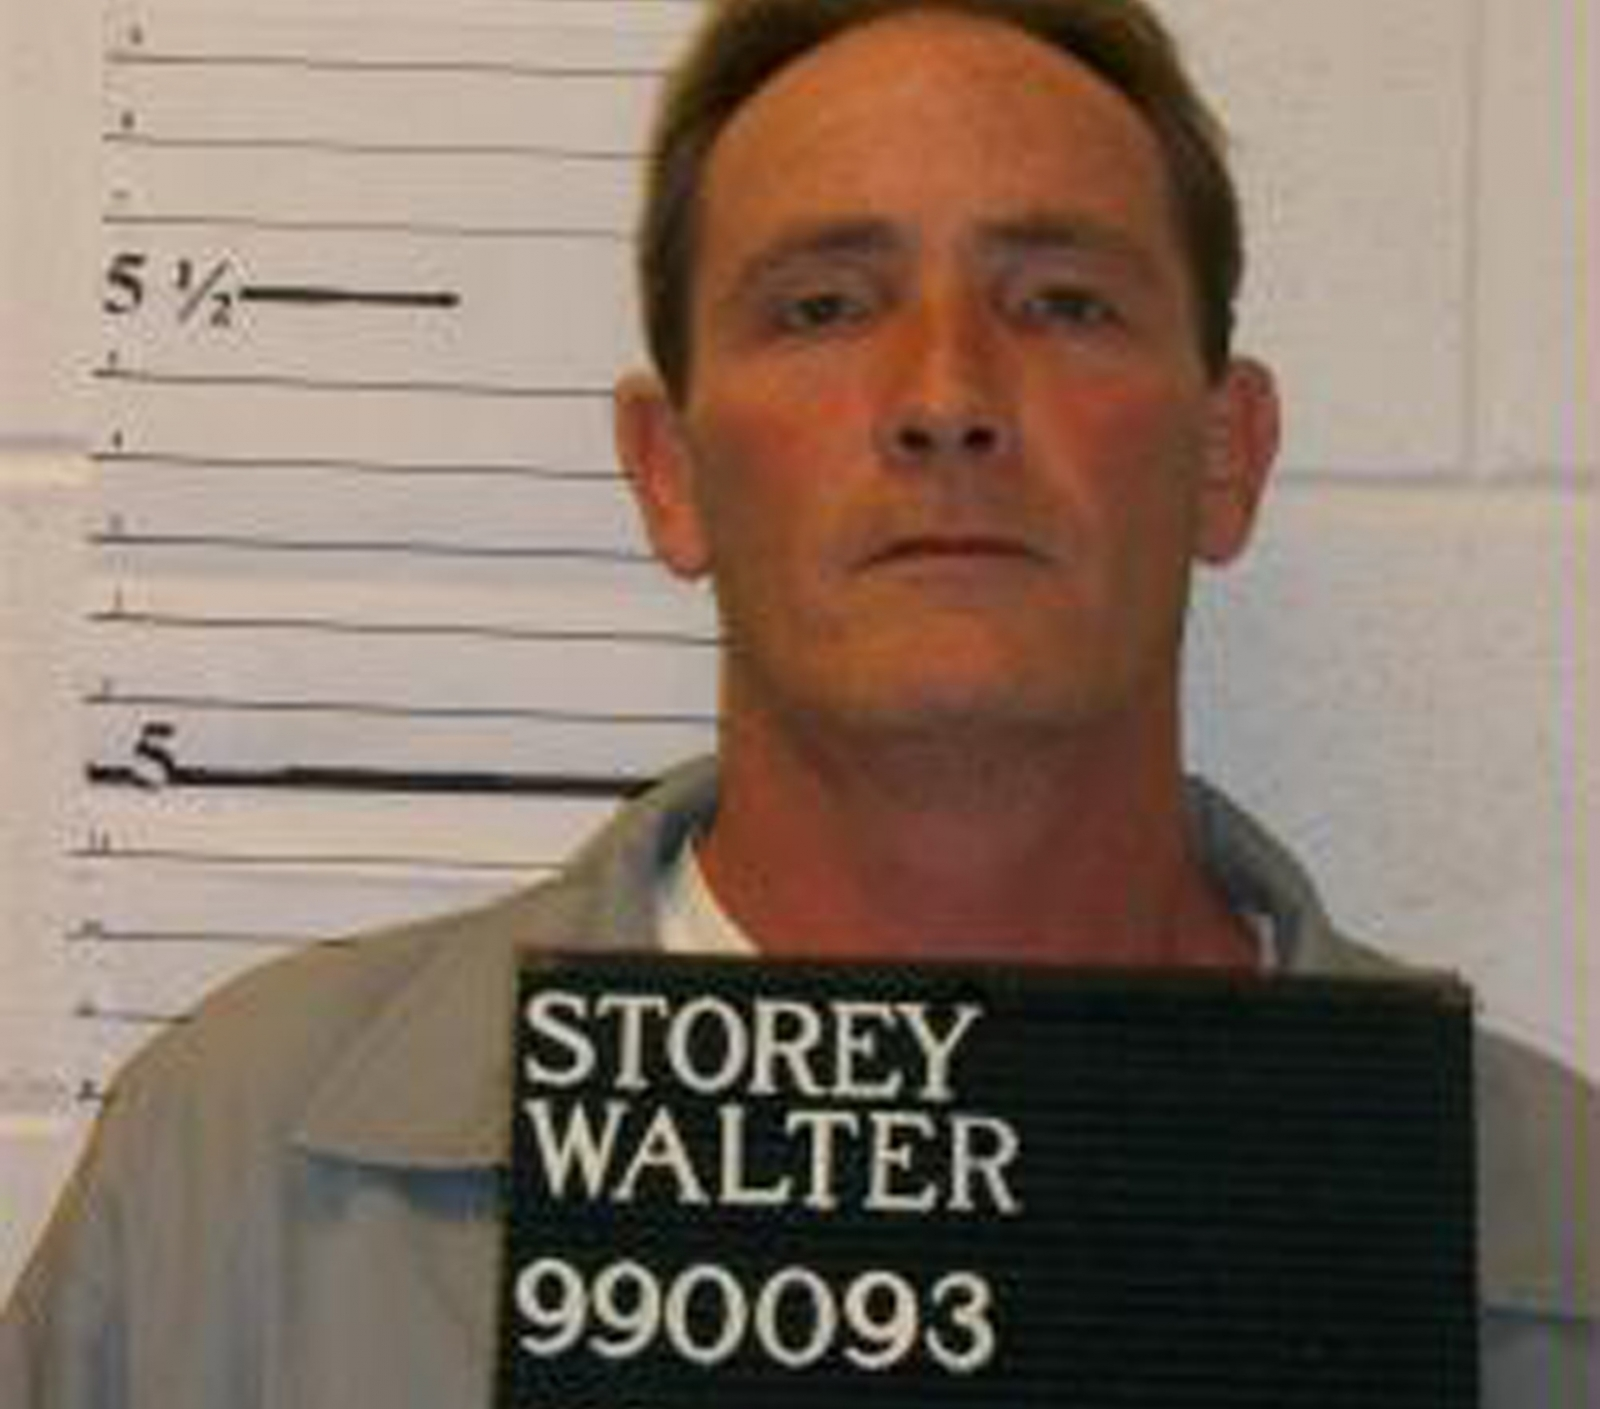 Walter Storey,